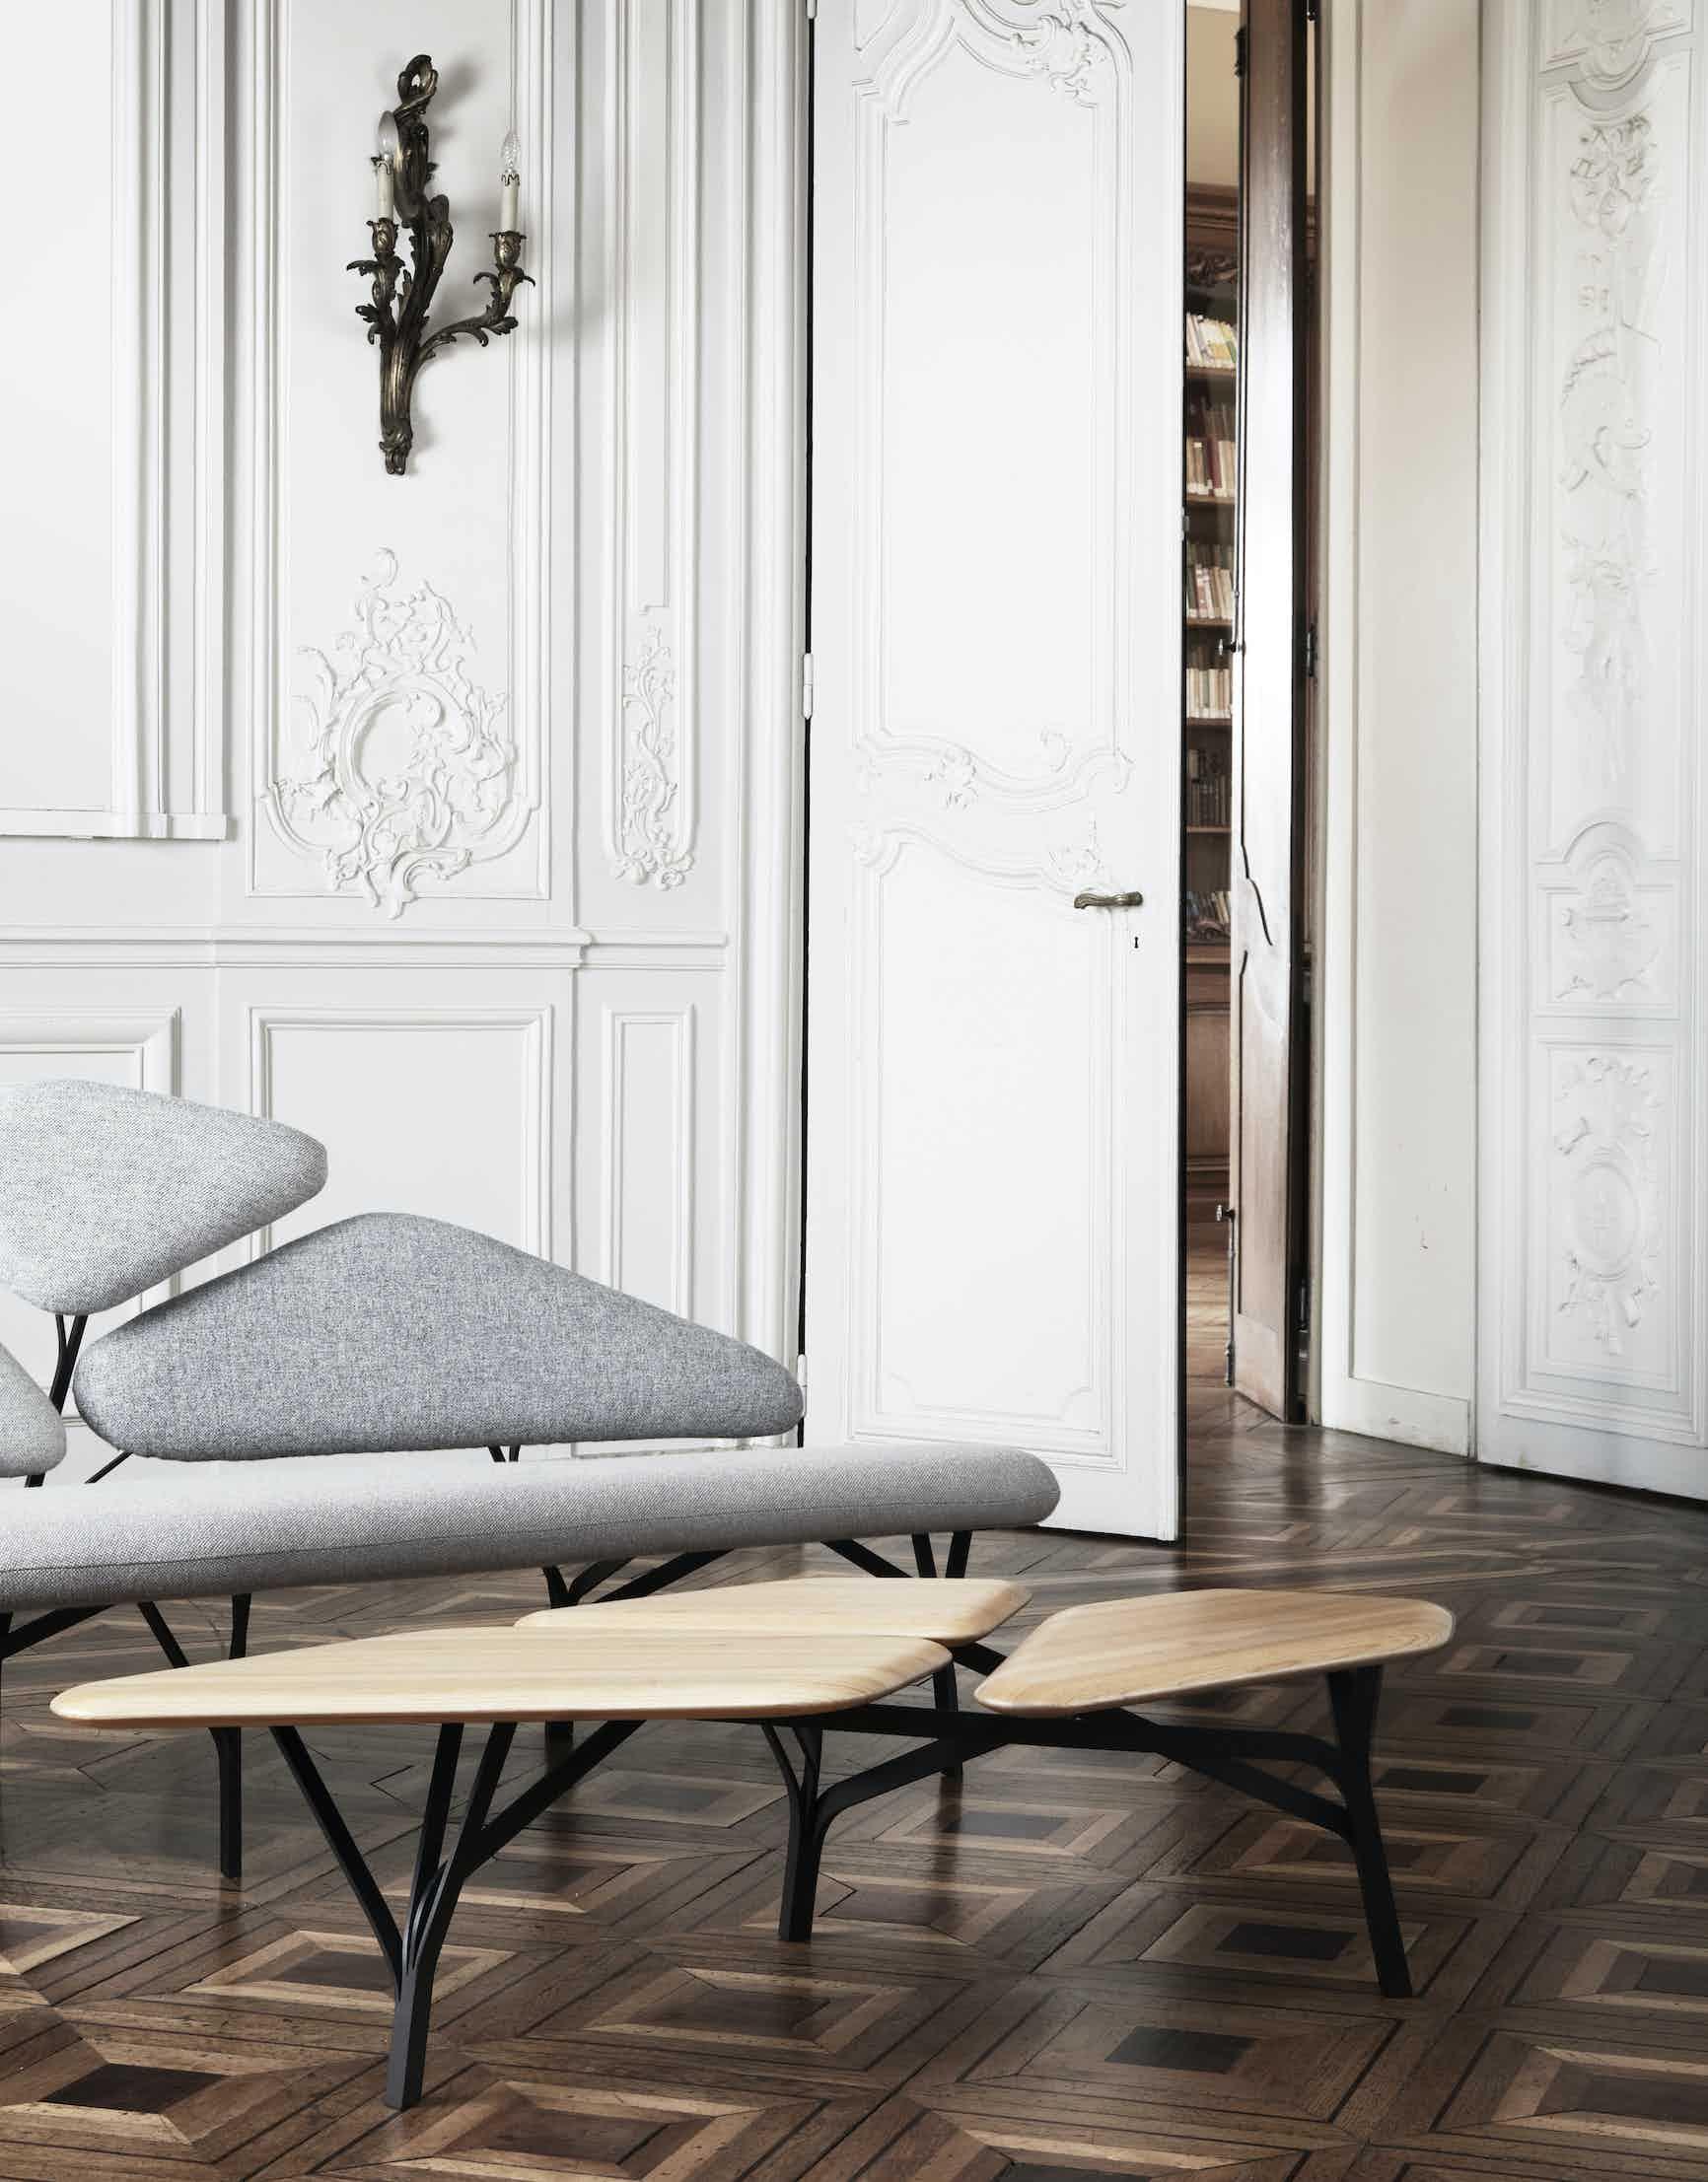 La chance furniture borghese coffee table insitu haute living